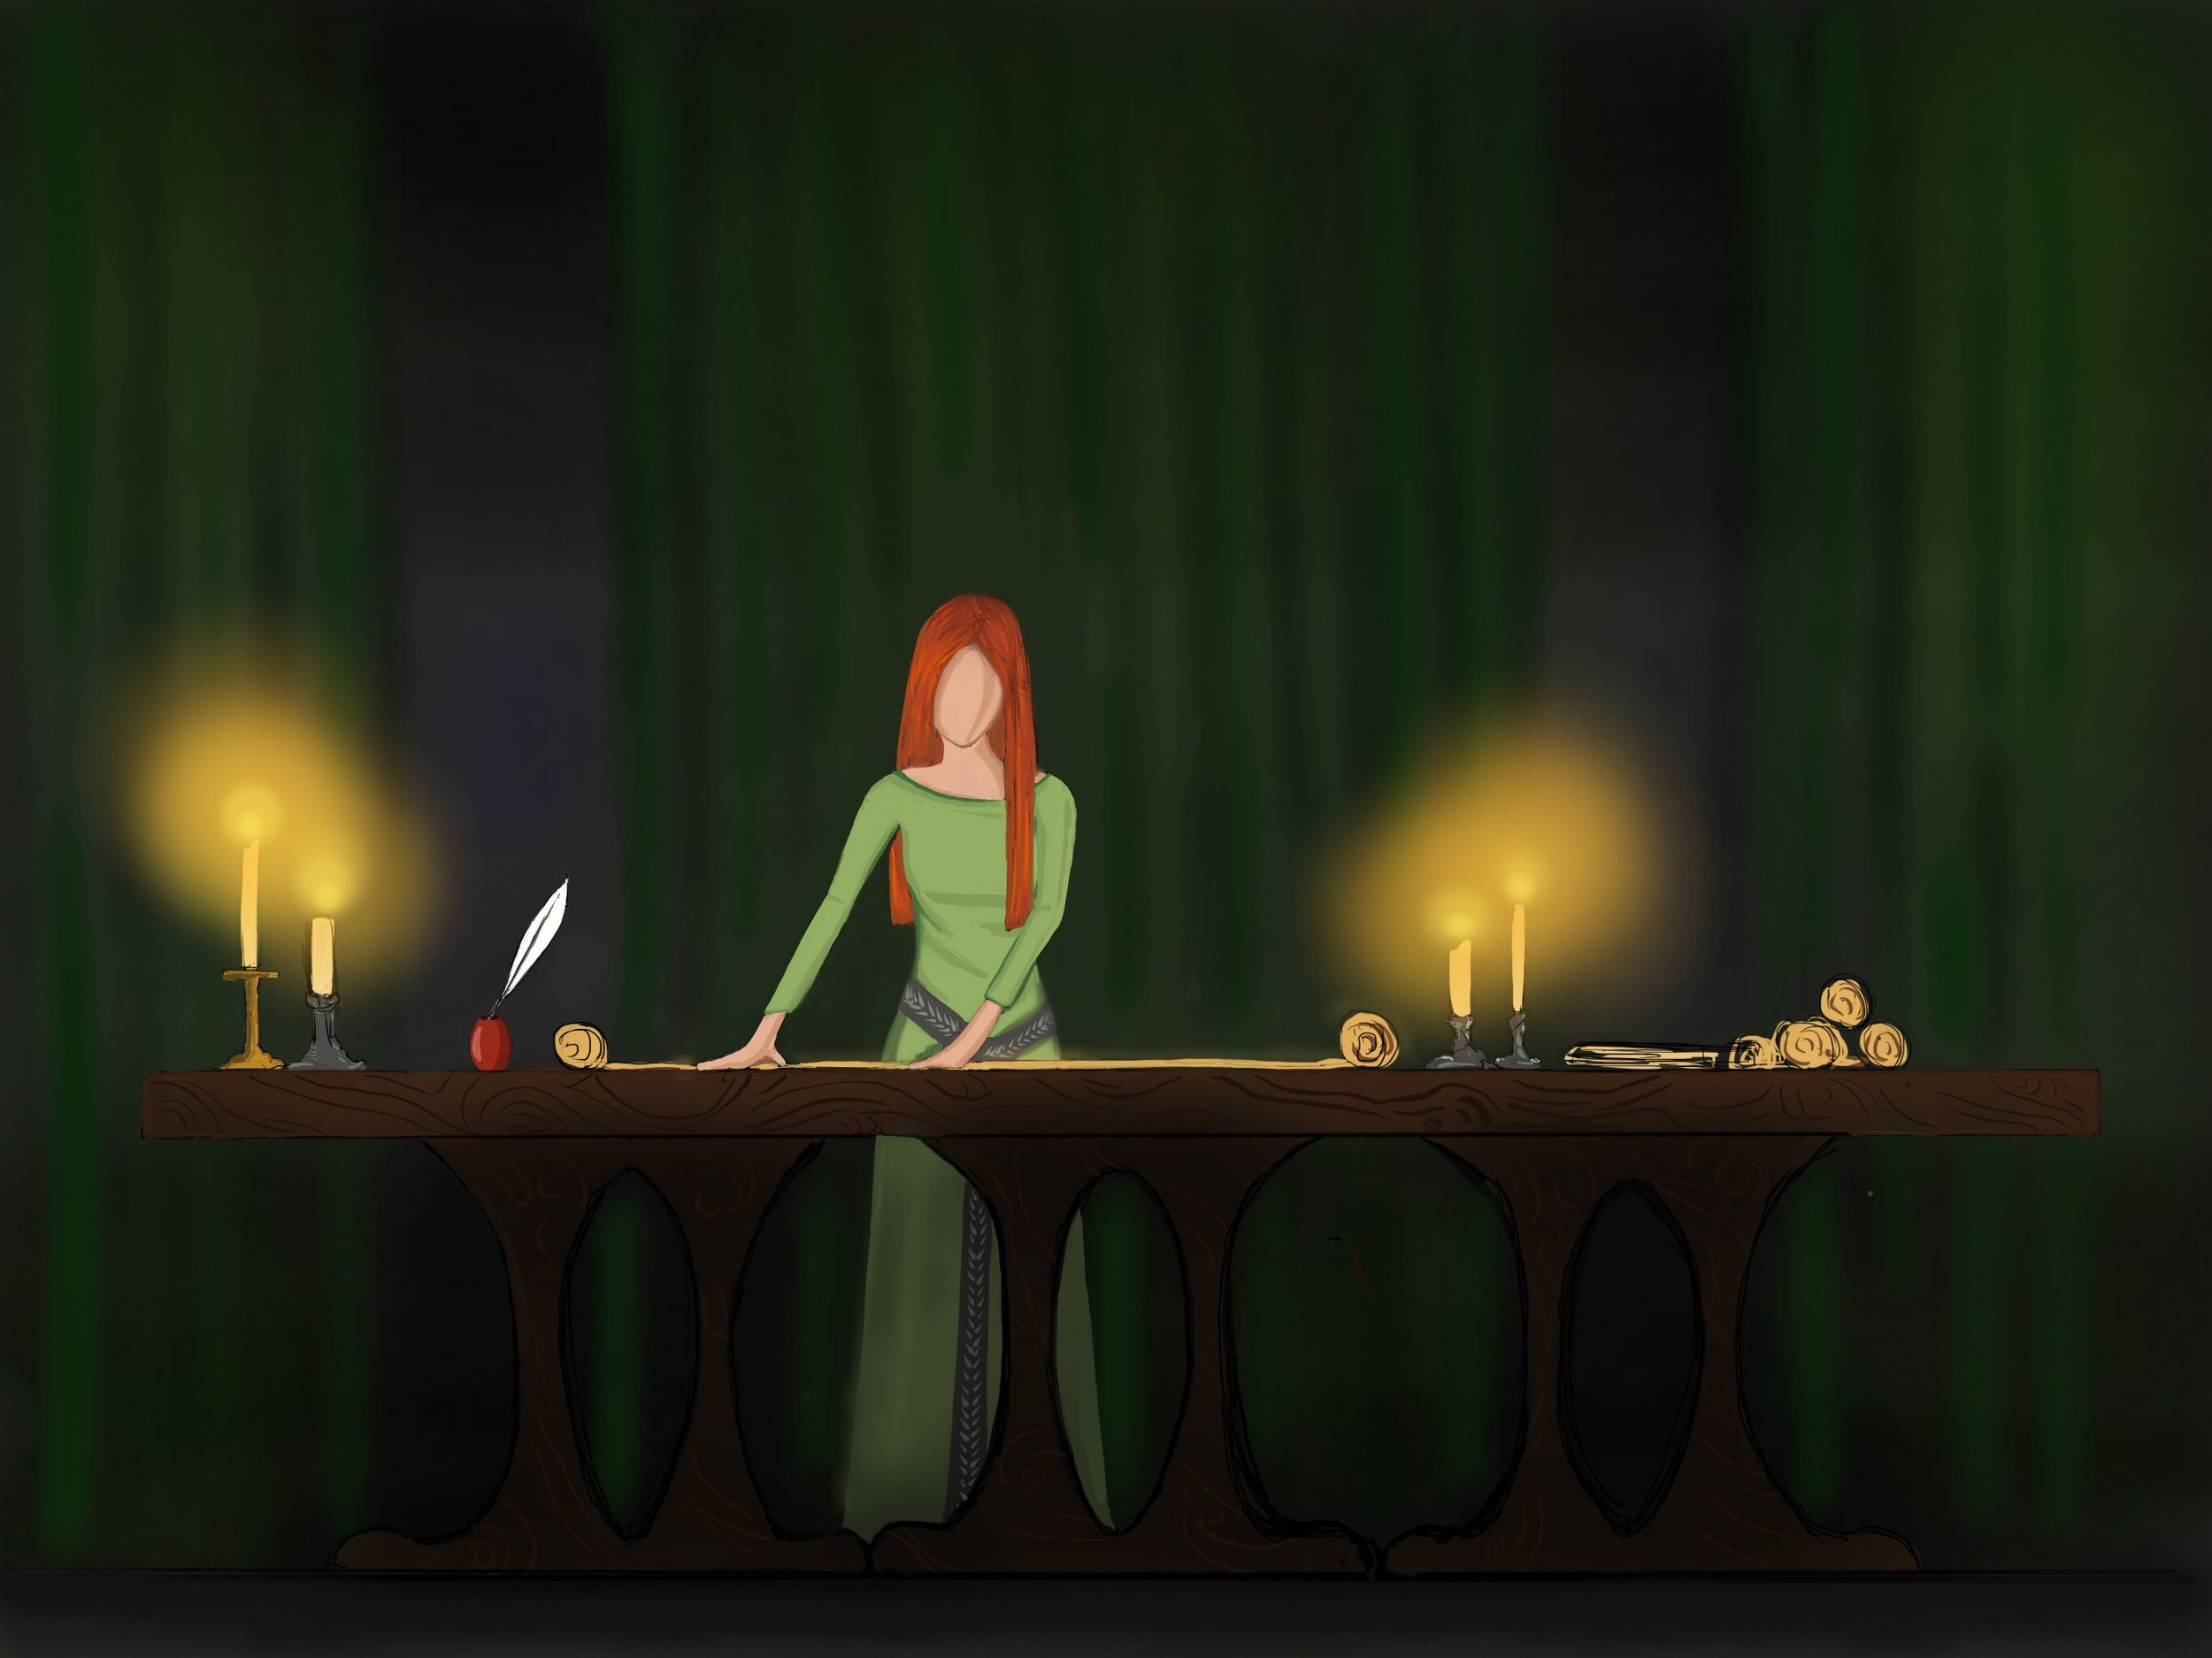 THE SCHOLAR - Eleanor studies the scrolls